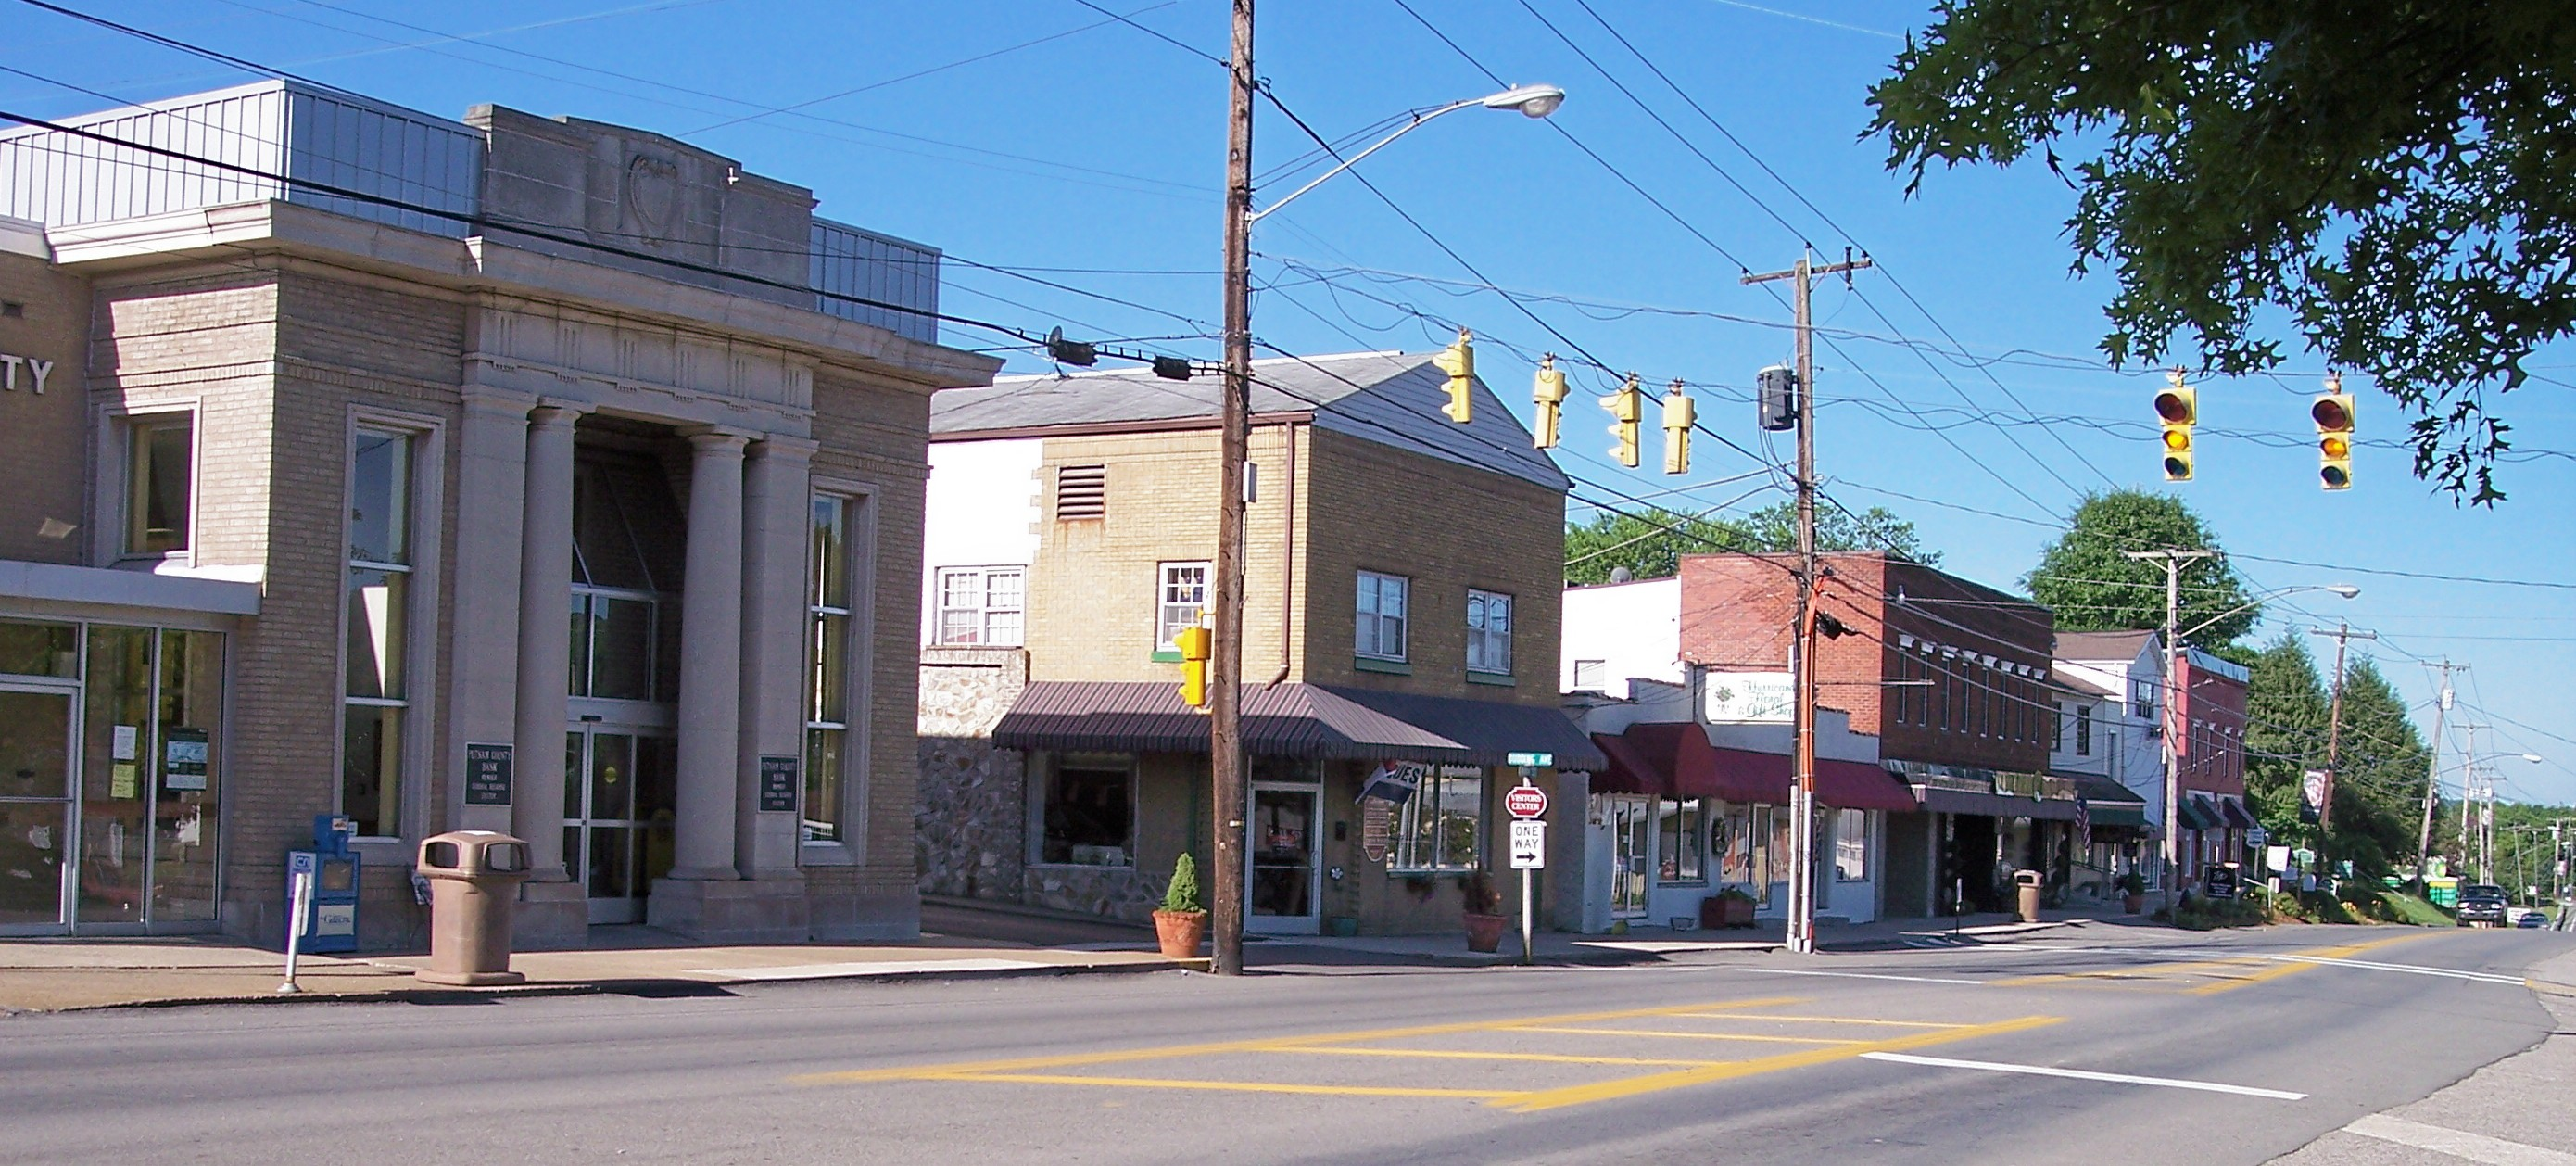 Hurricane Wv On Pinterest Main Street West Virginia And